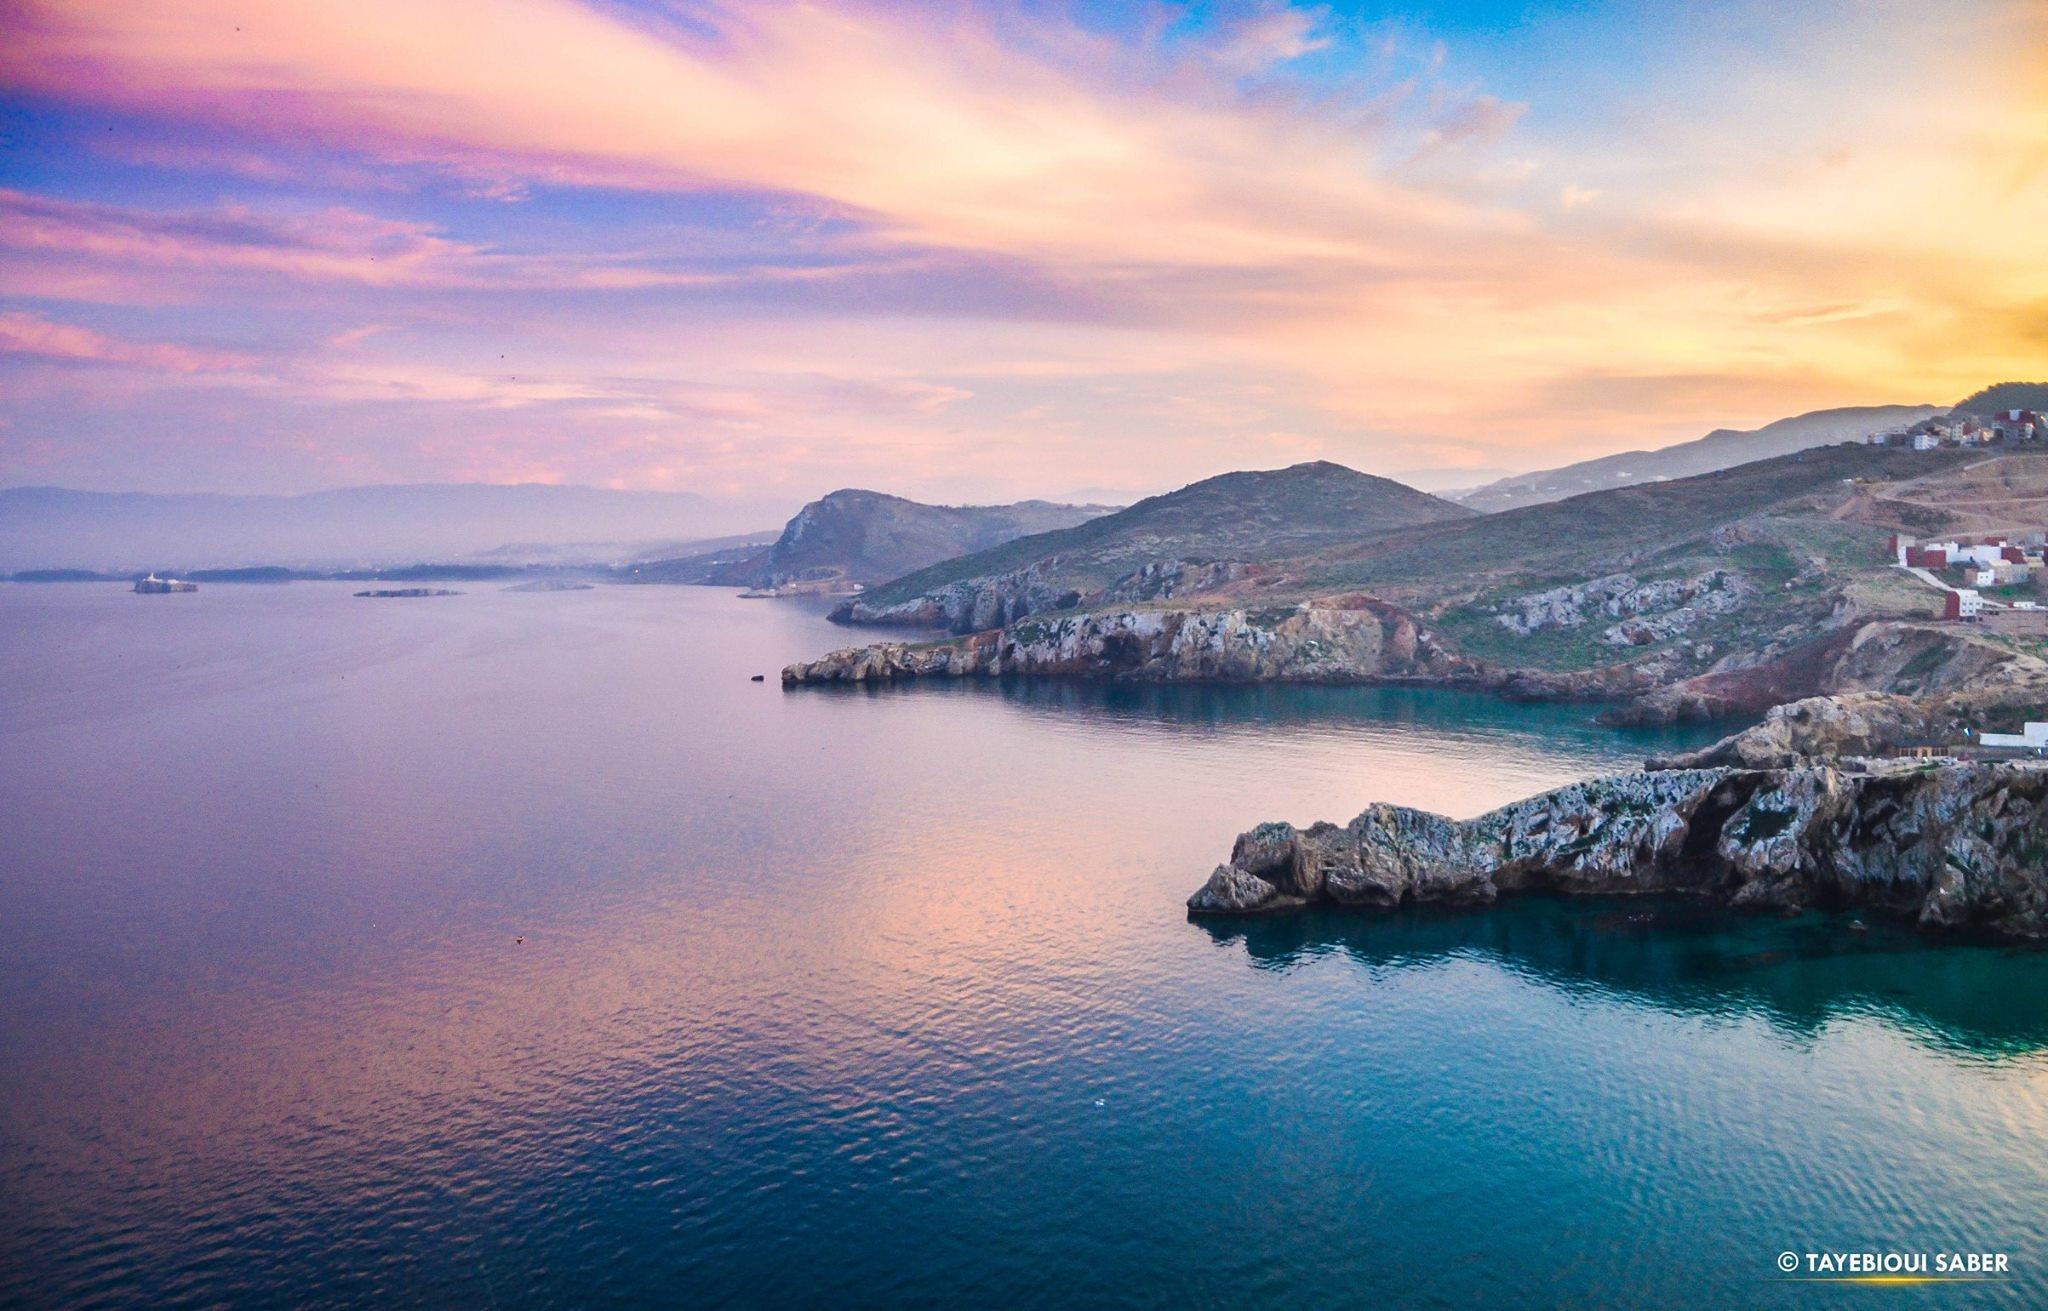 Alhoceima bay by Saber Tayebioui